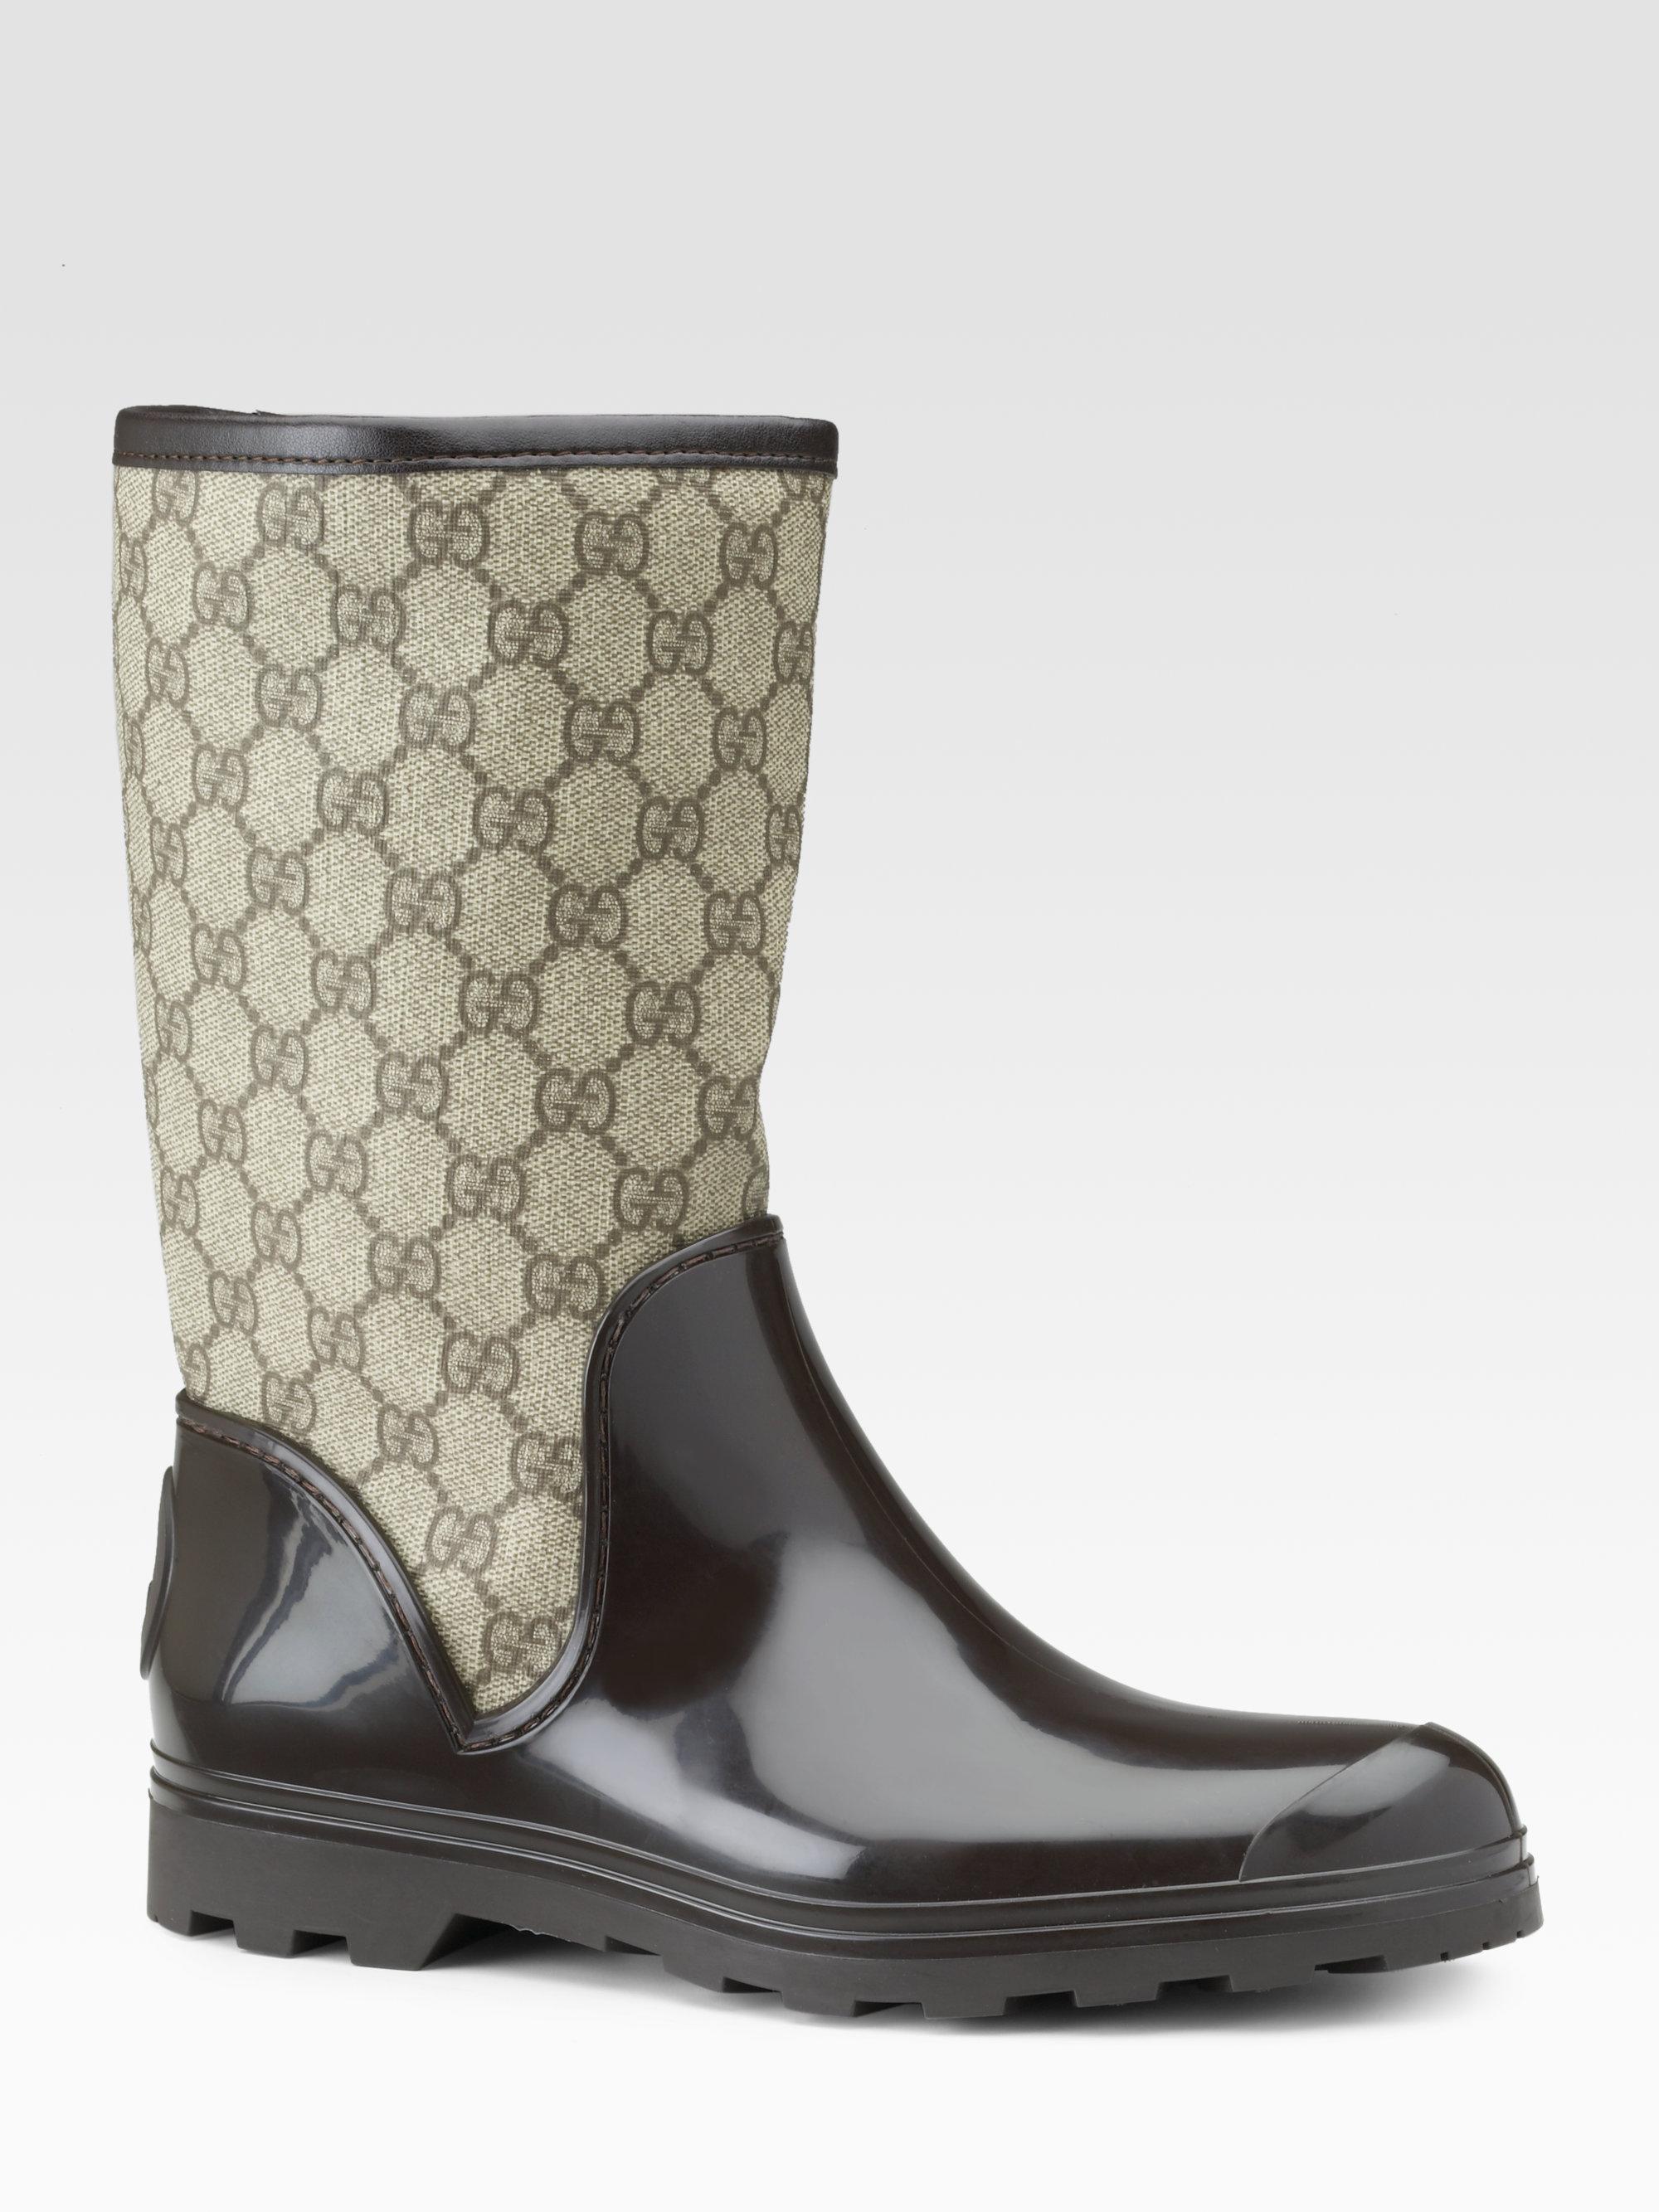 Gucci Prato Flat Rainboots In Brown Lyst